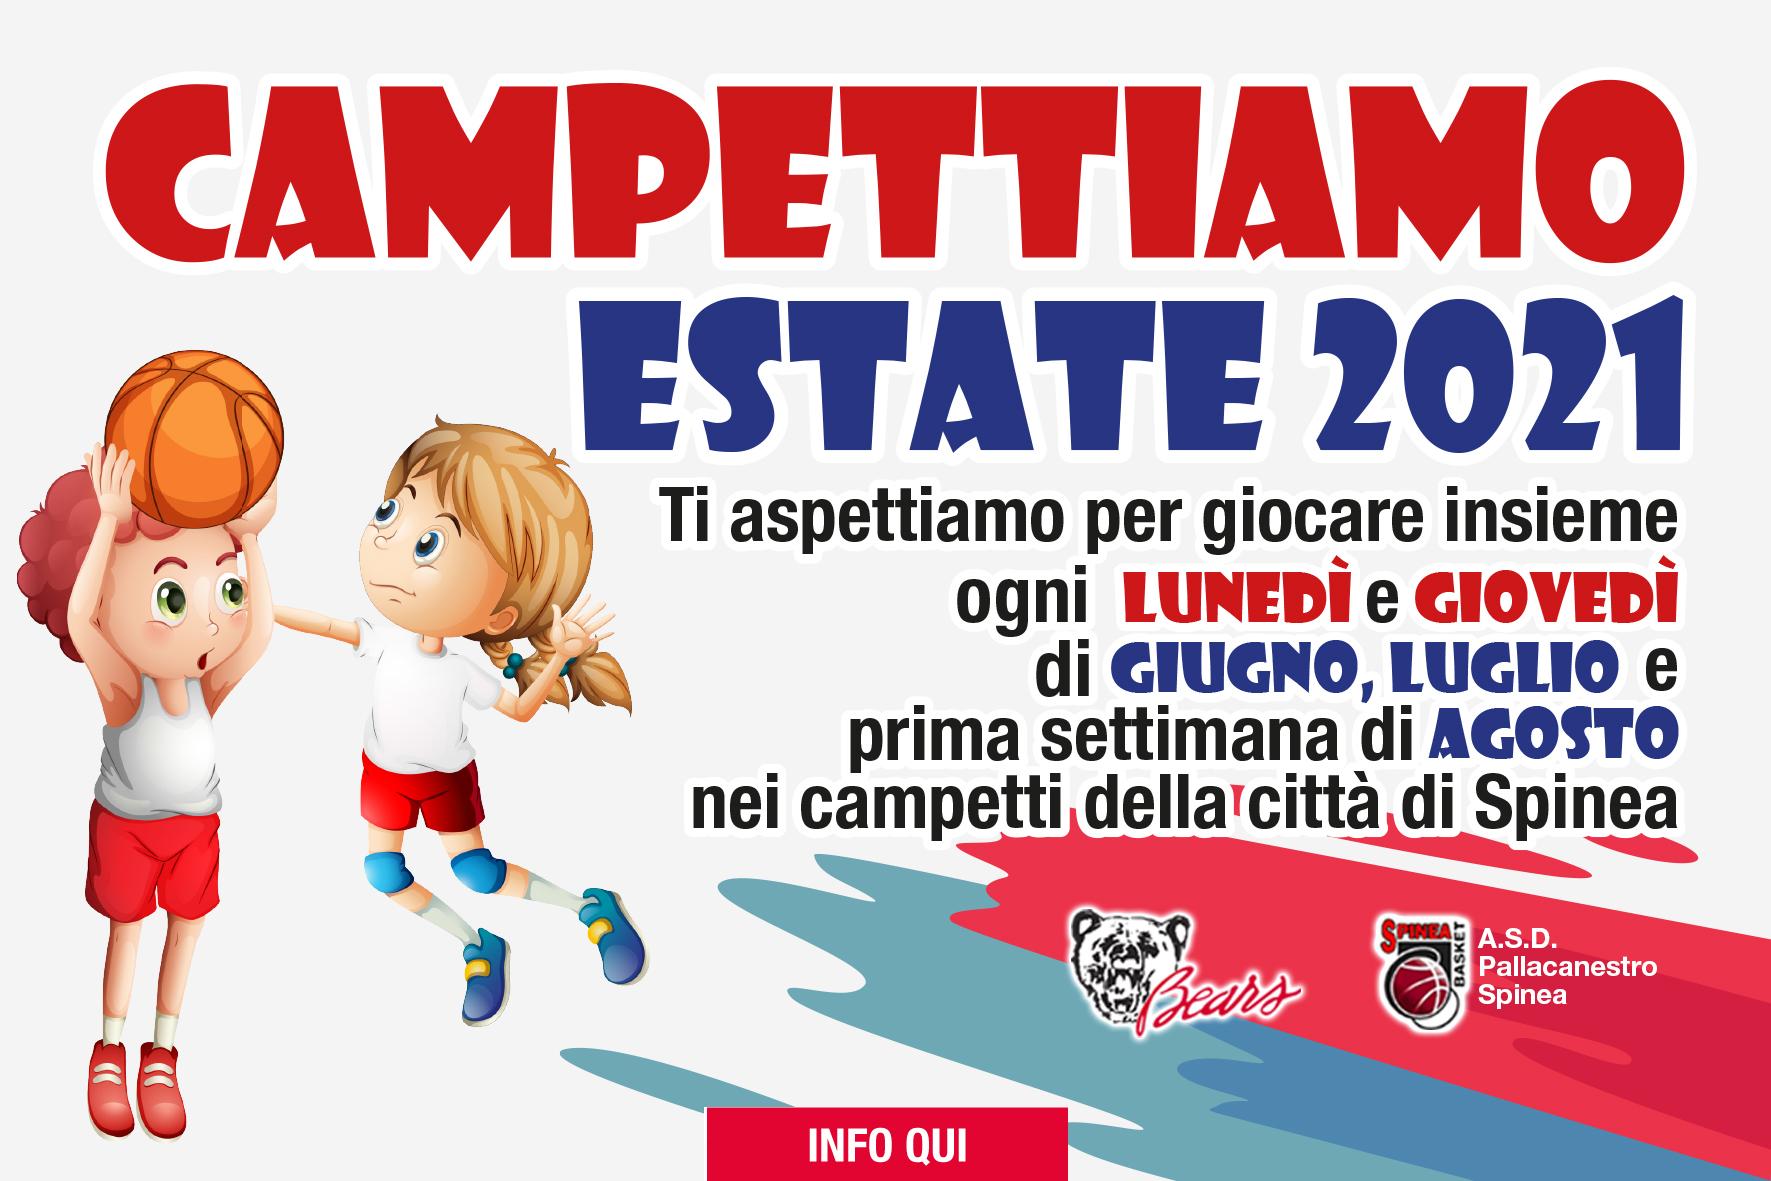 http://www.asdpallacanestrospinea.it/demo/wp-content/uploads/2021/06/BASKET_SPINEA_campettiamo_home_estate21.jpg